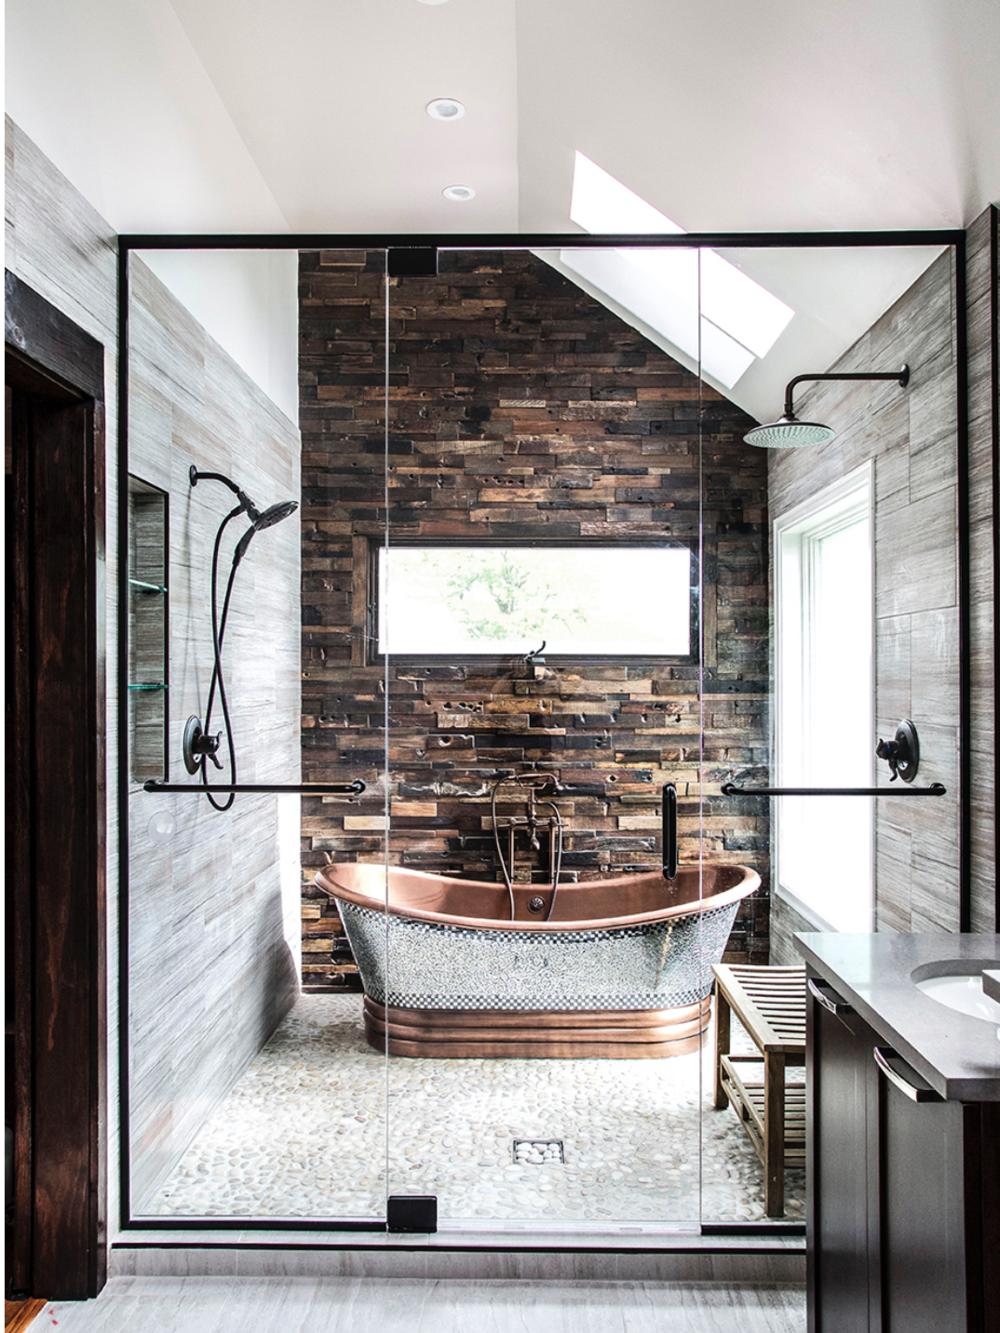 beautiful bathroom designs | The 15 Most Beautiful Bathrooms on Pinterest - Sanctuary ...